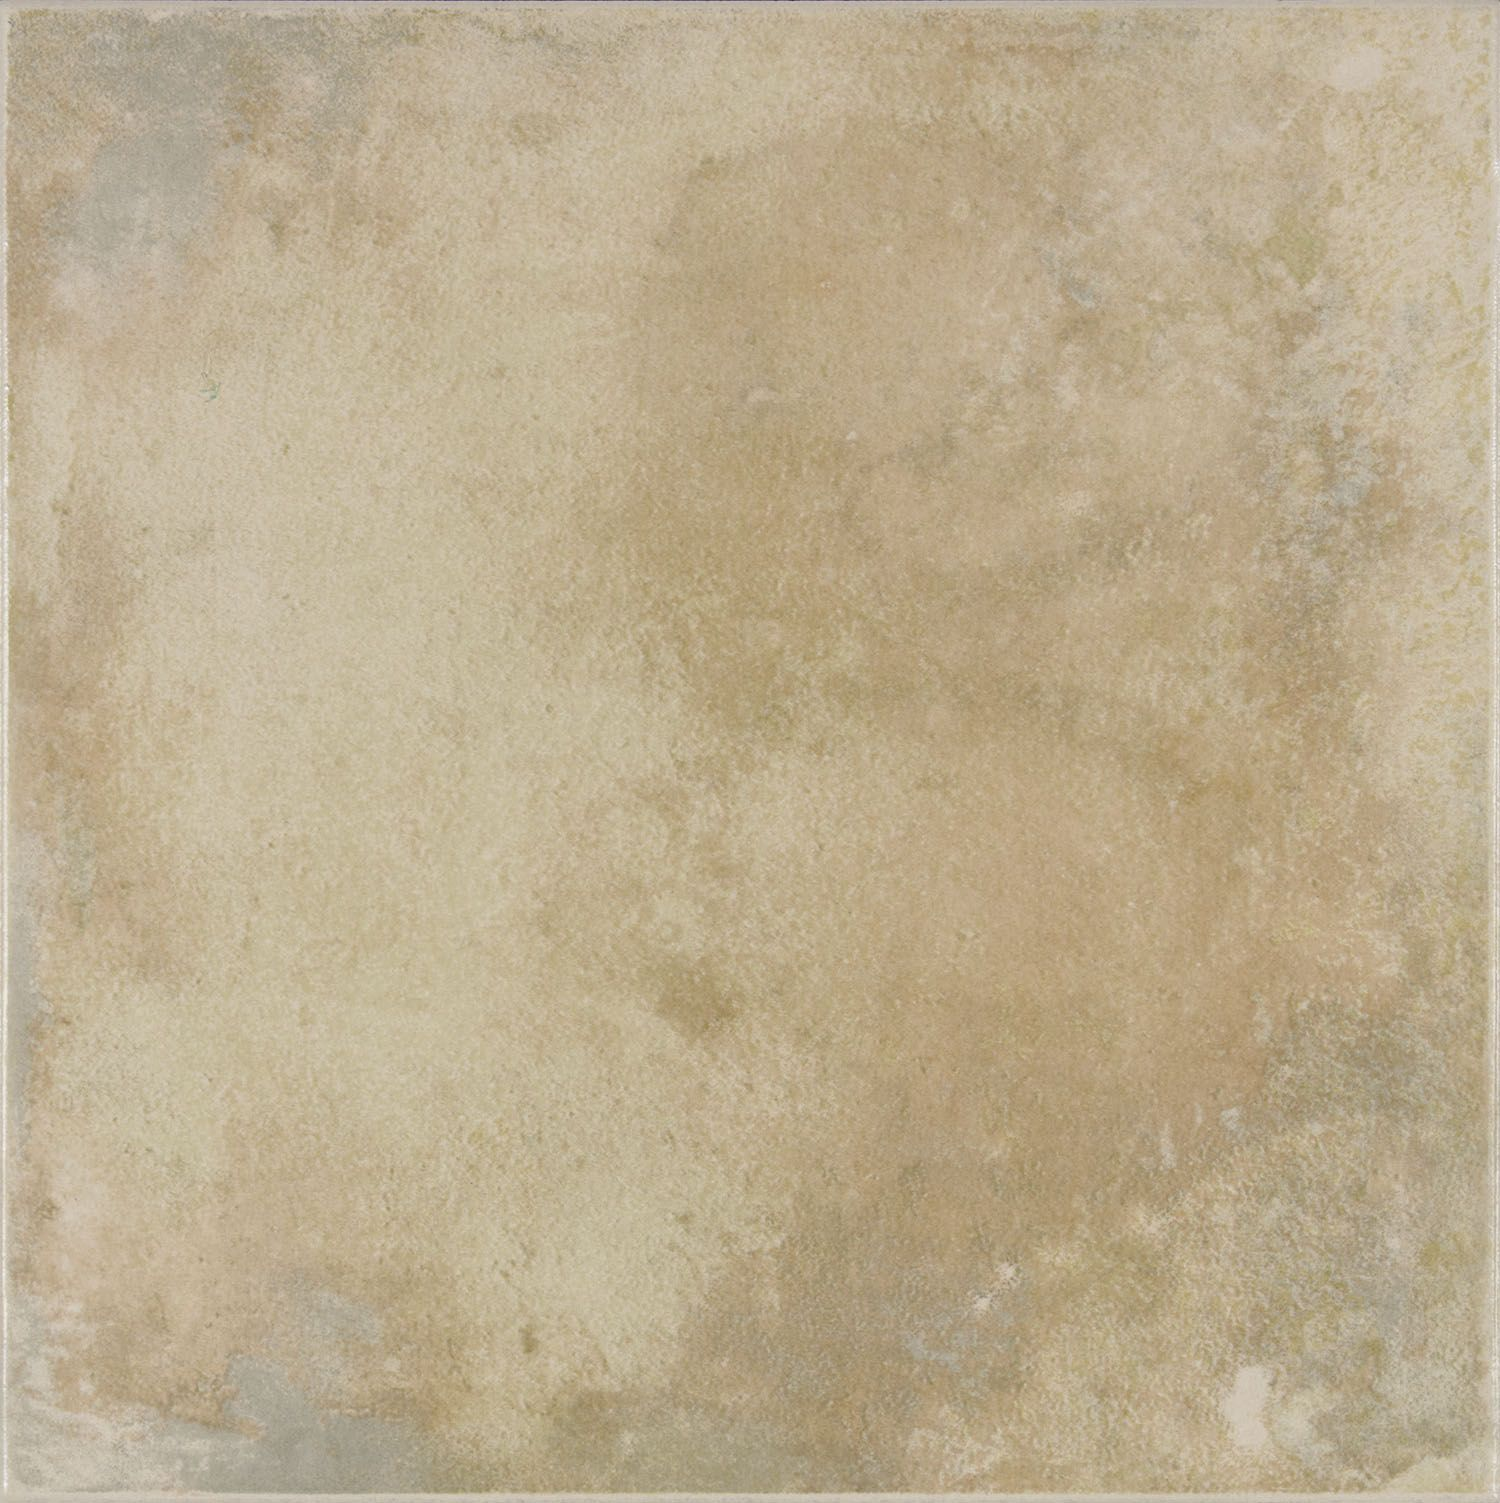 46 030 13x13 cotto honey floor tile ceramic tile www 46 030 13x13 cotto honey floor tile ceramic tile www dailygadgetfo Gallery